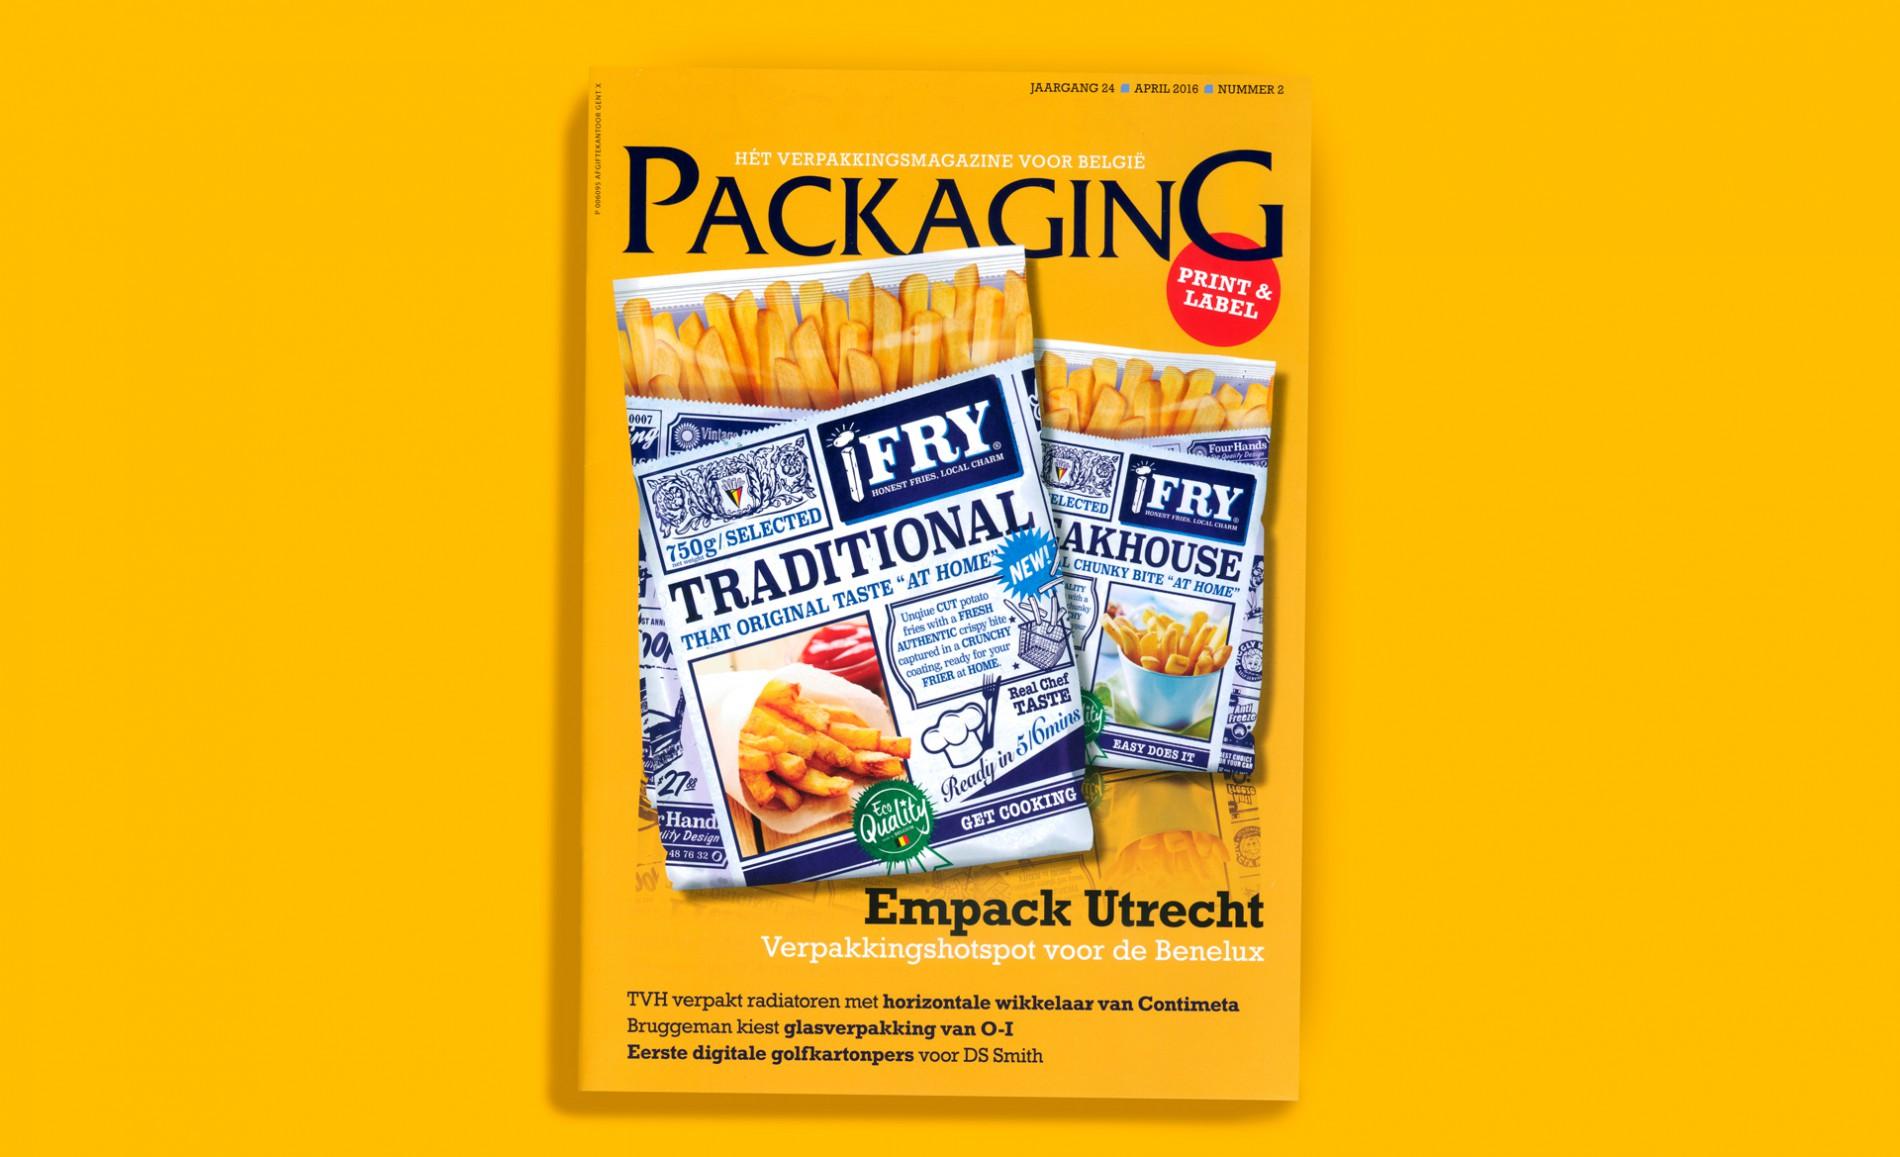 Quatre Mains package design - Packaging magazine, ifry, empack utrecht, quatre mains